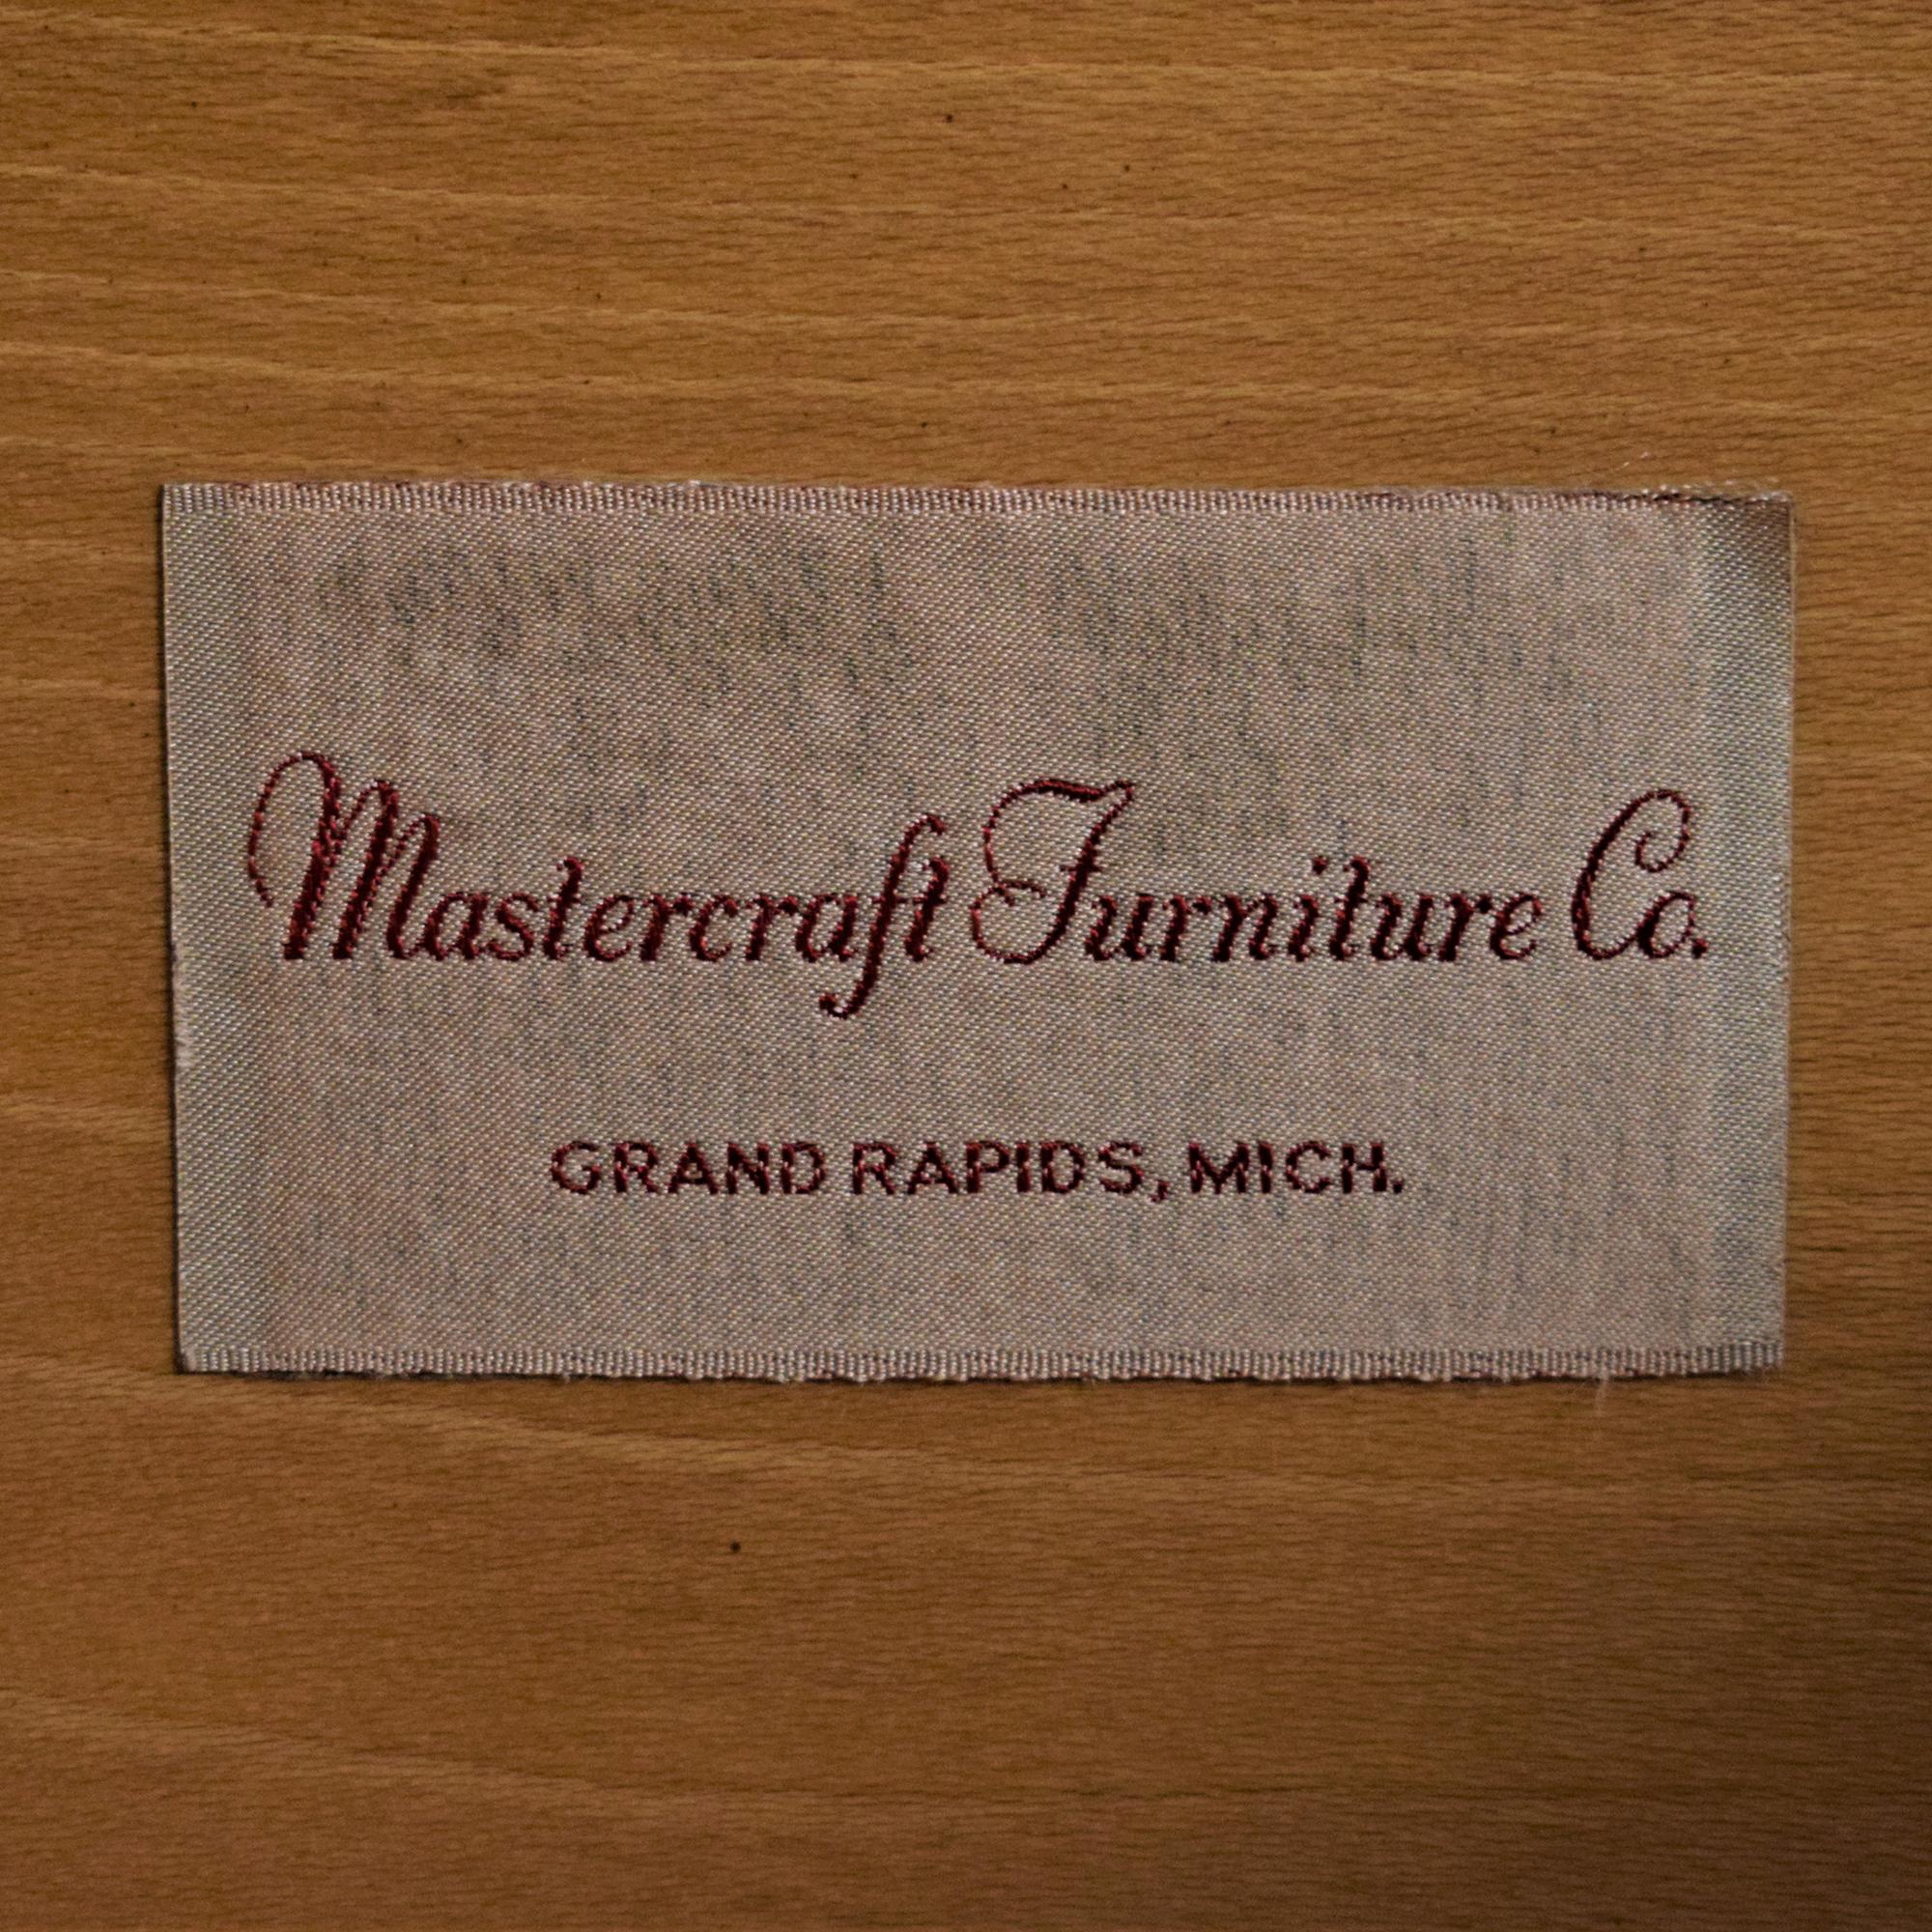 Mastercraft Furniture Mastercraft Armoire price